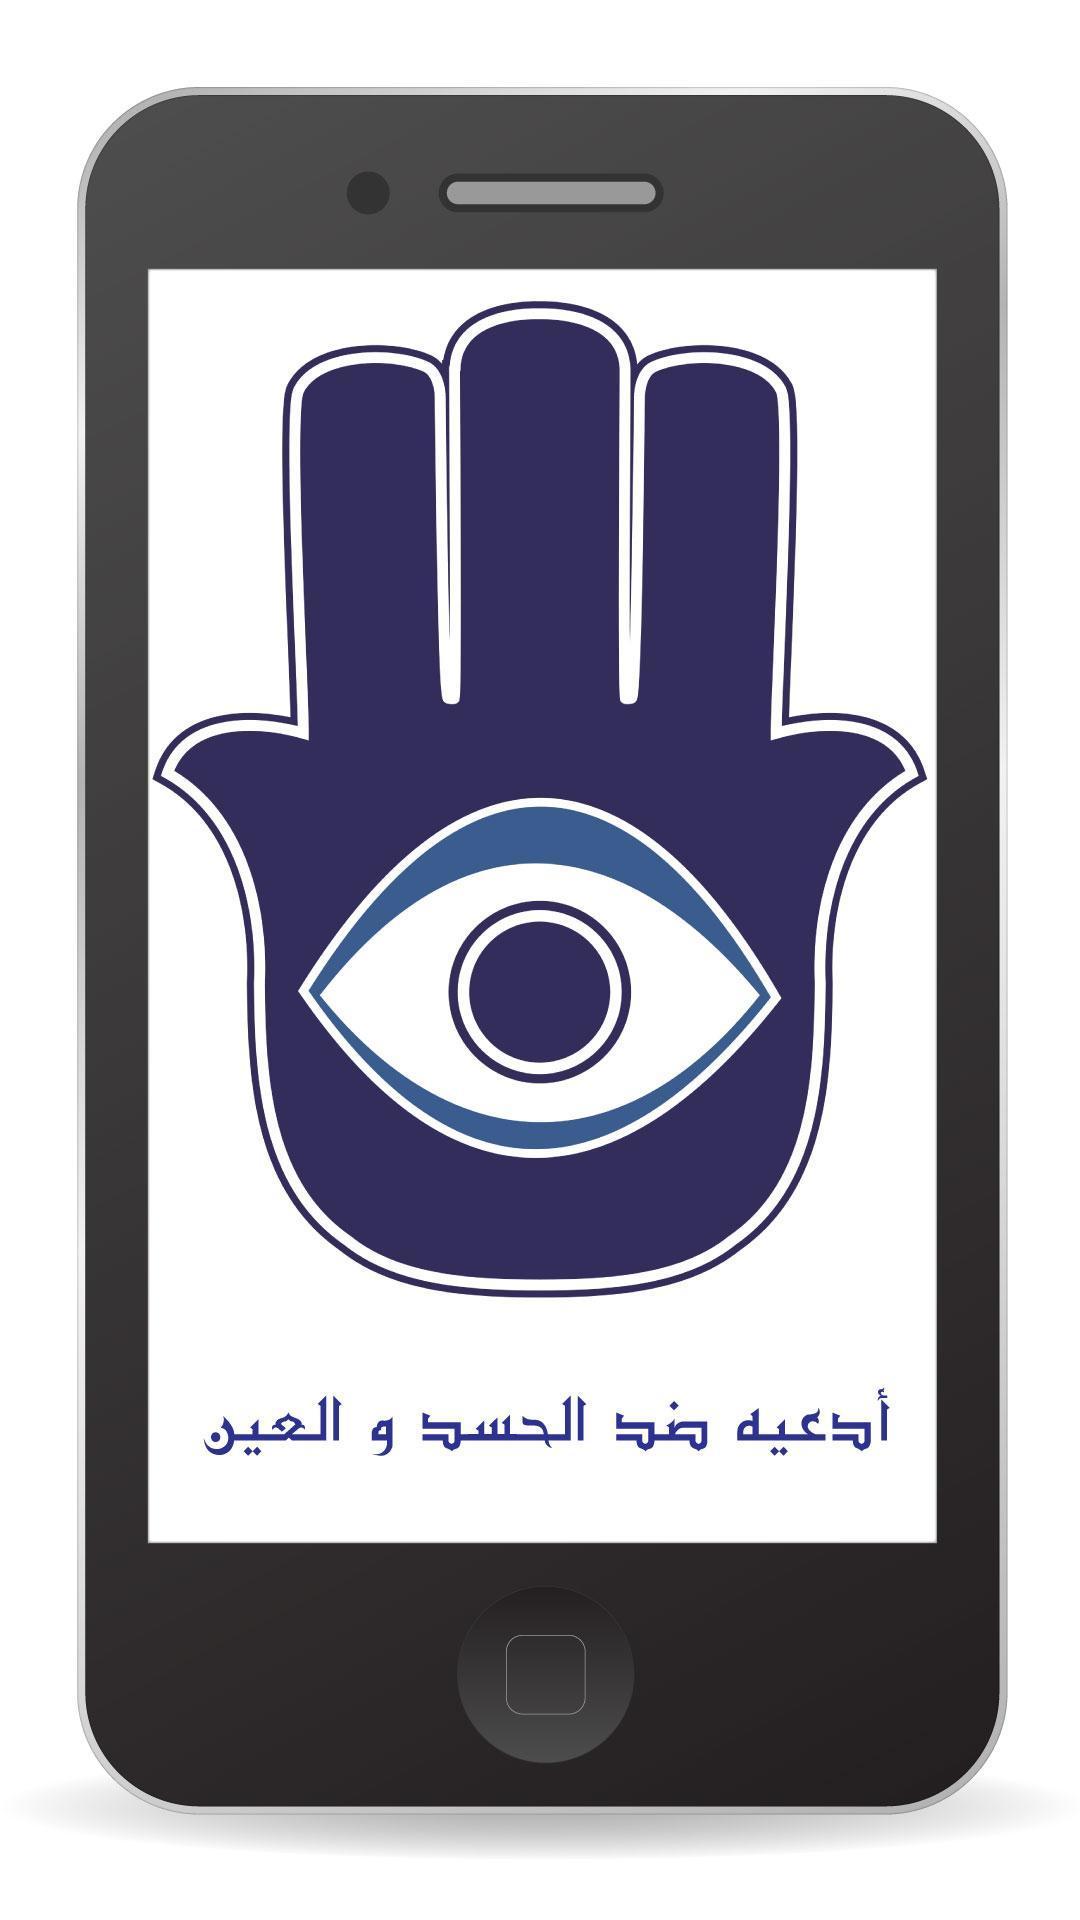 ضد الحسد For Android Apk Download 15